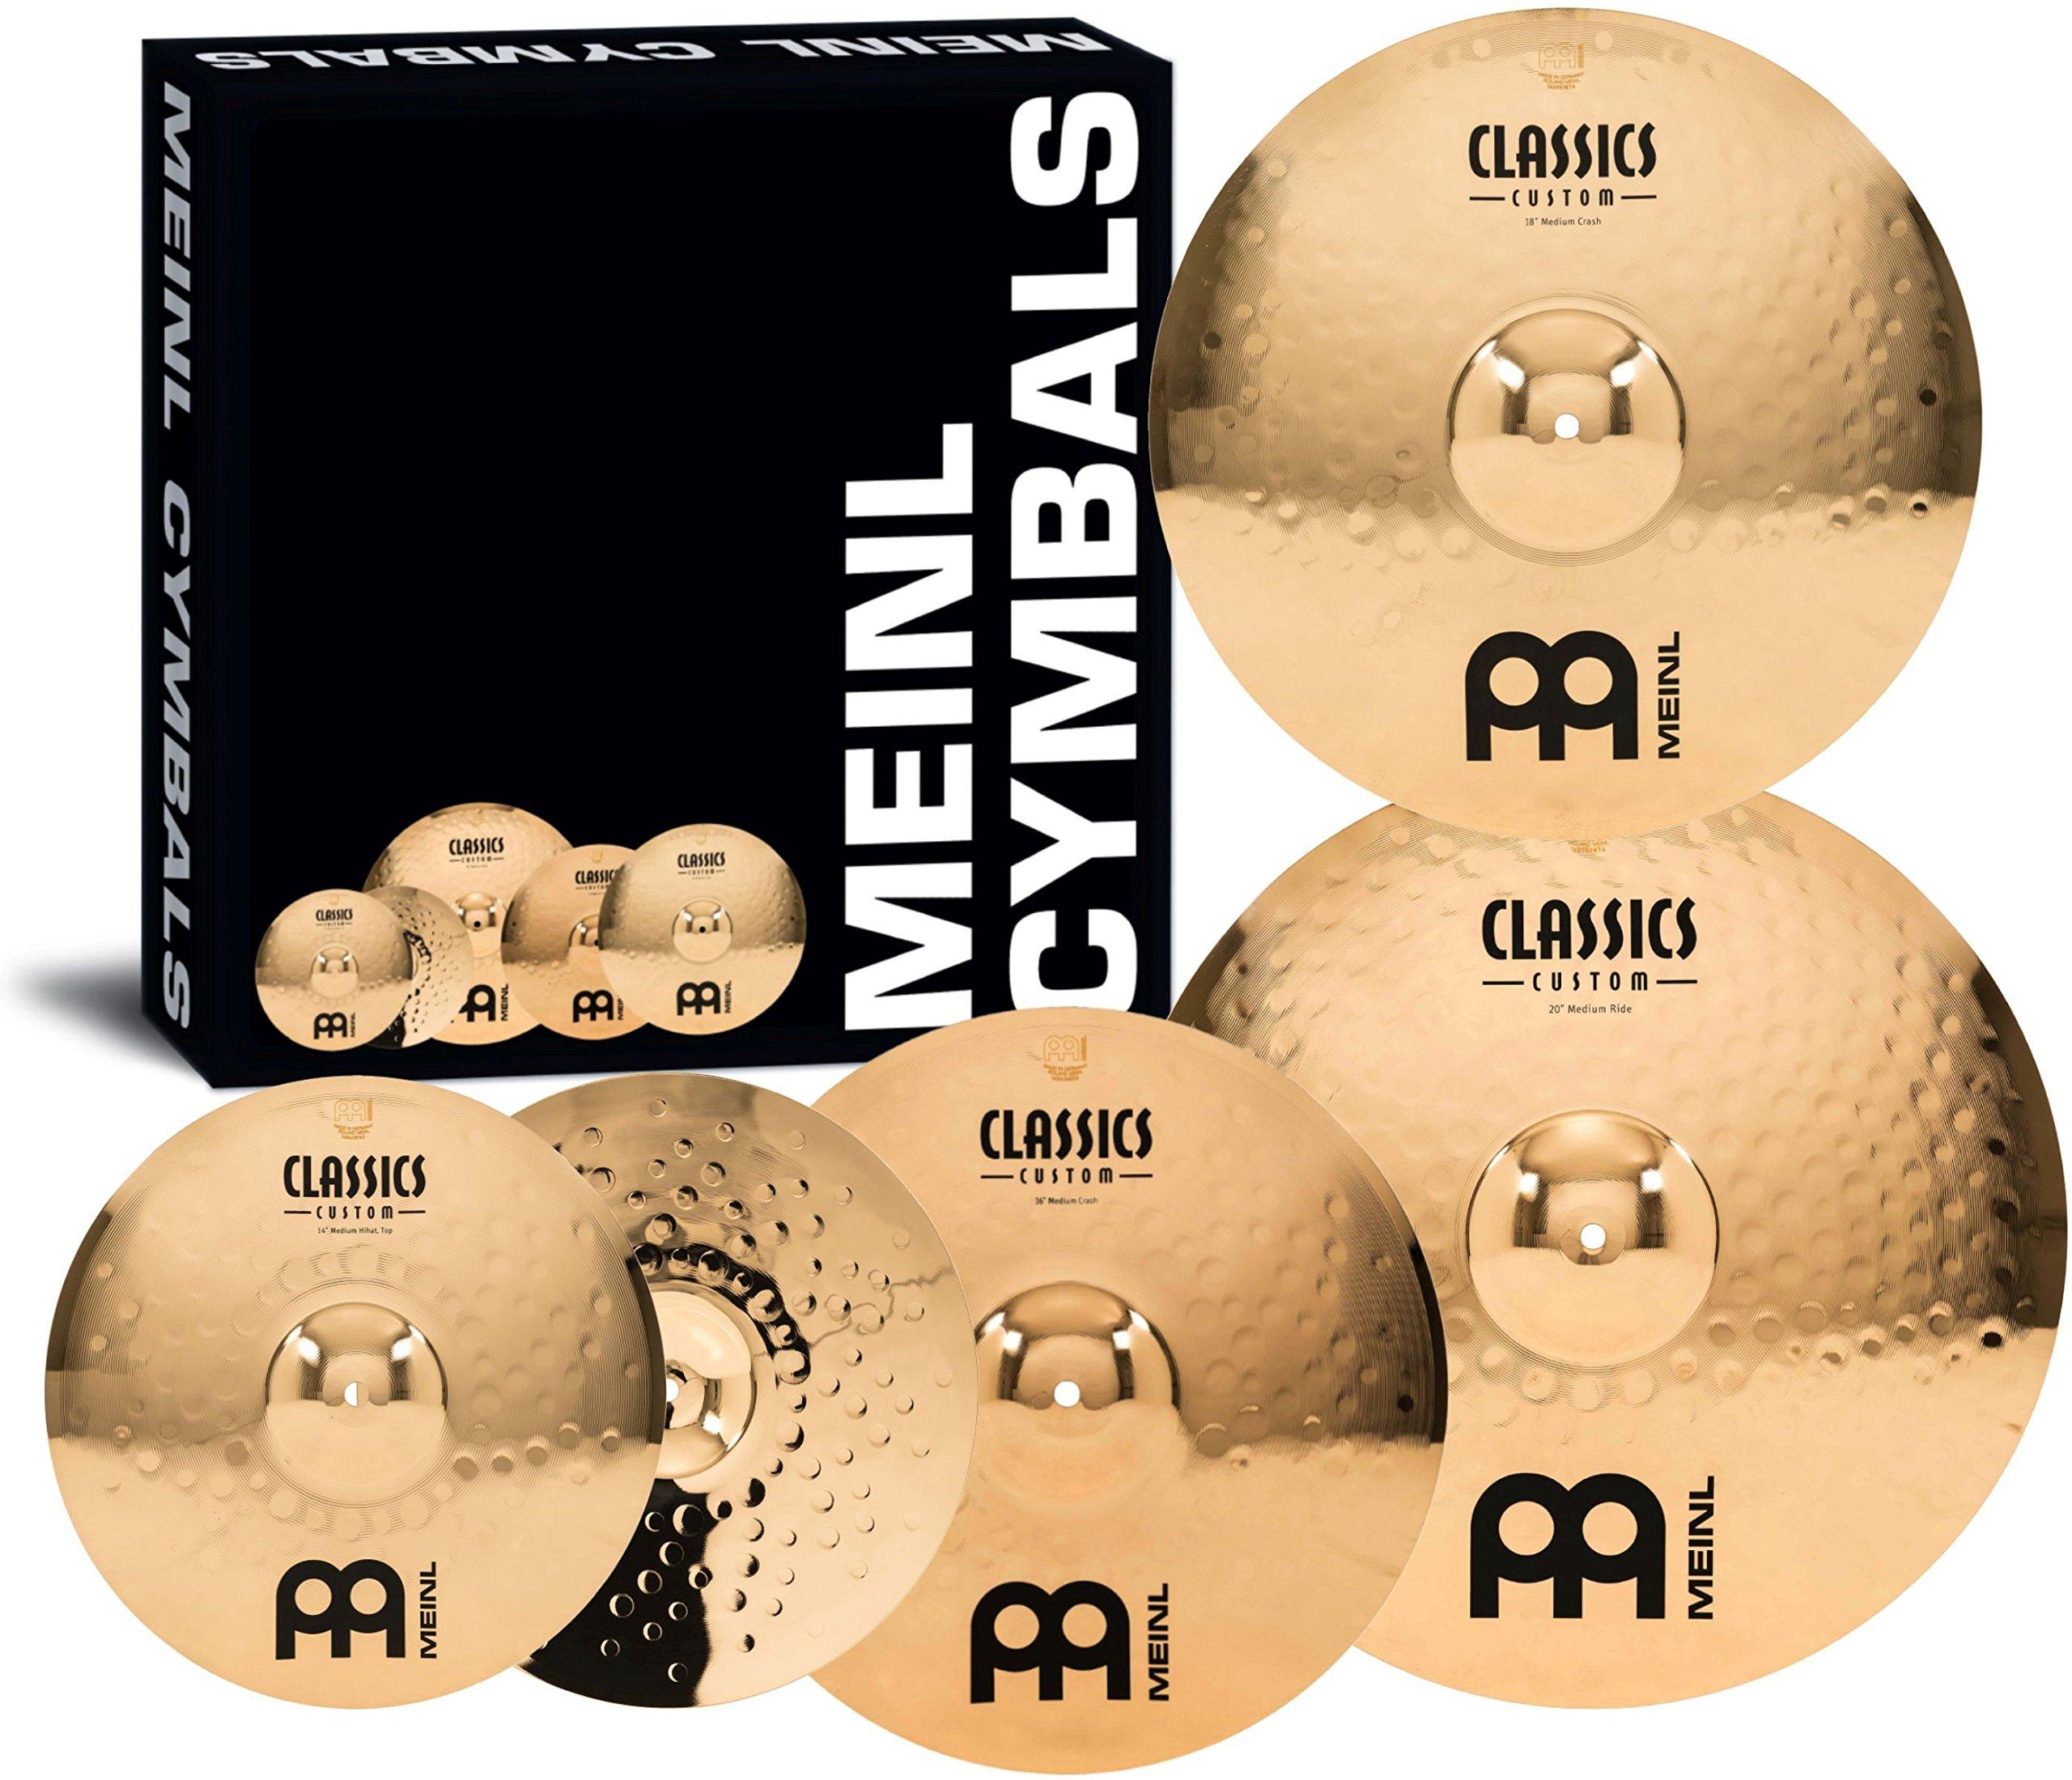 Meinl Cymbals CC-141620+18 Classics Custom Bonus Pack Cymbal Box Set with 18'' Crash